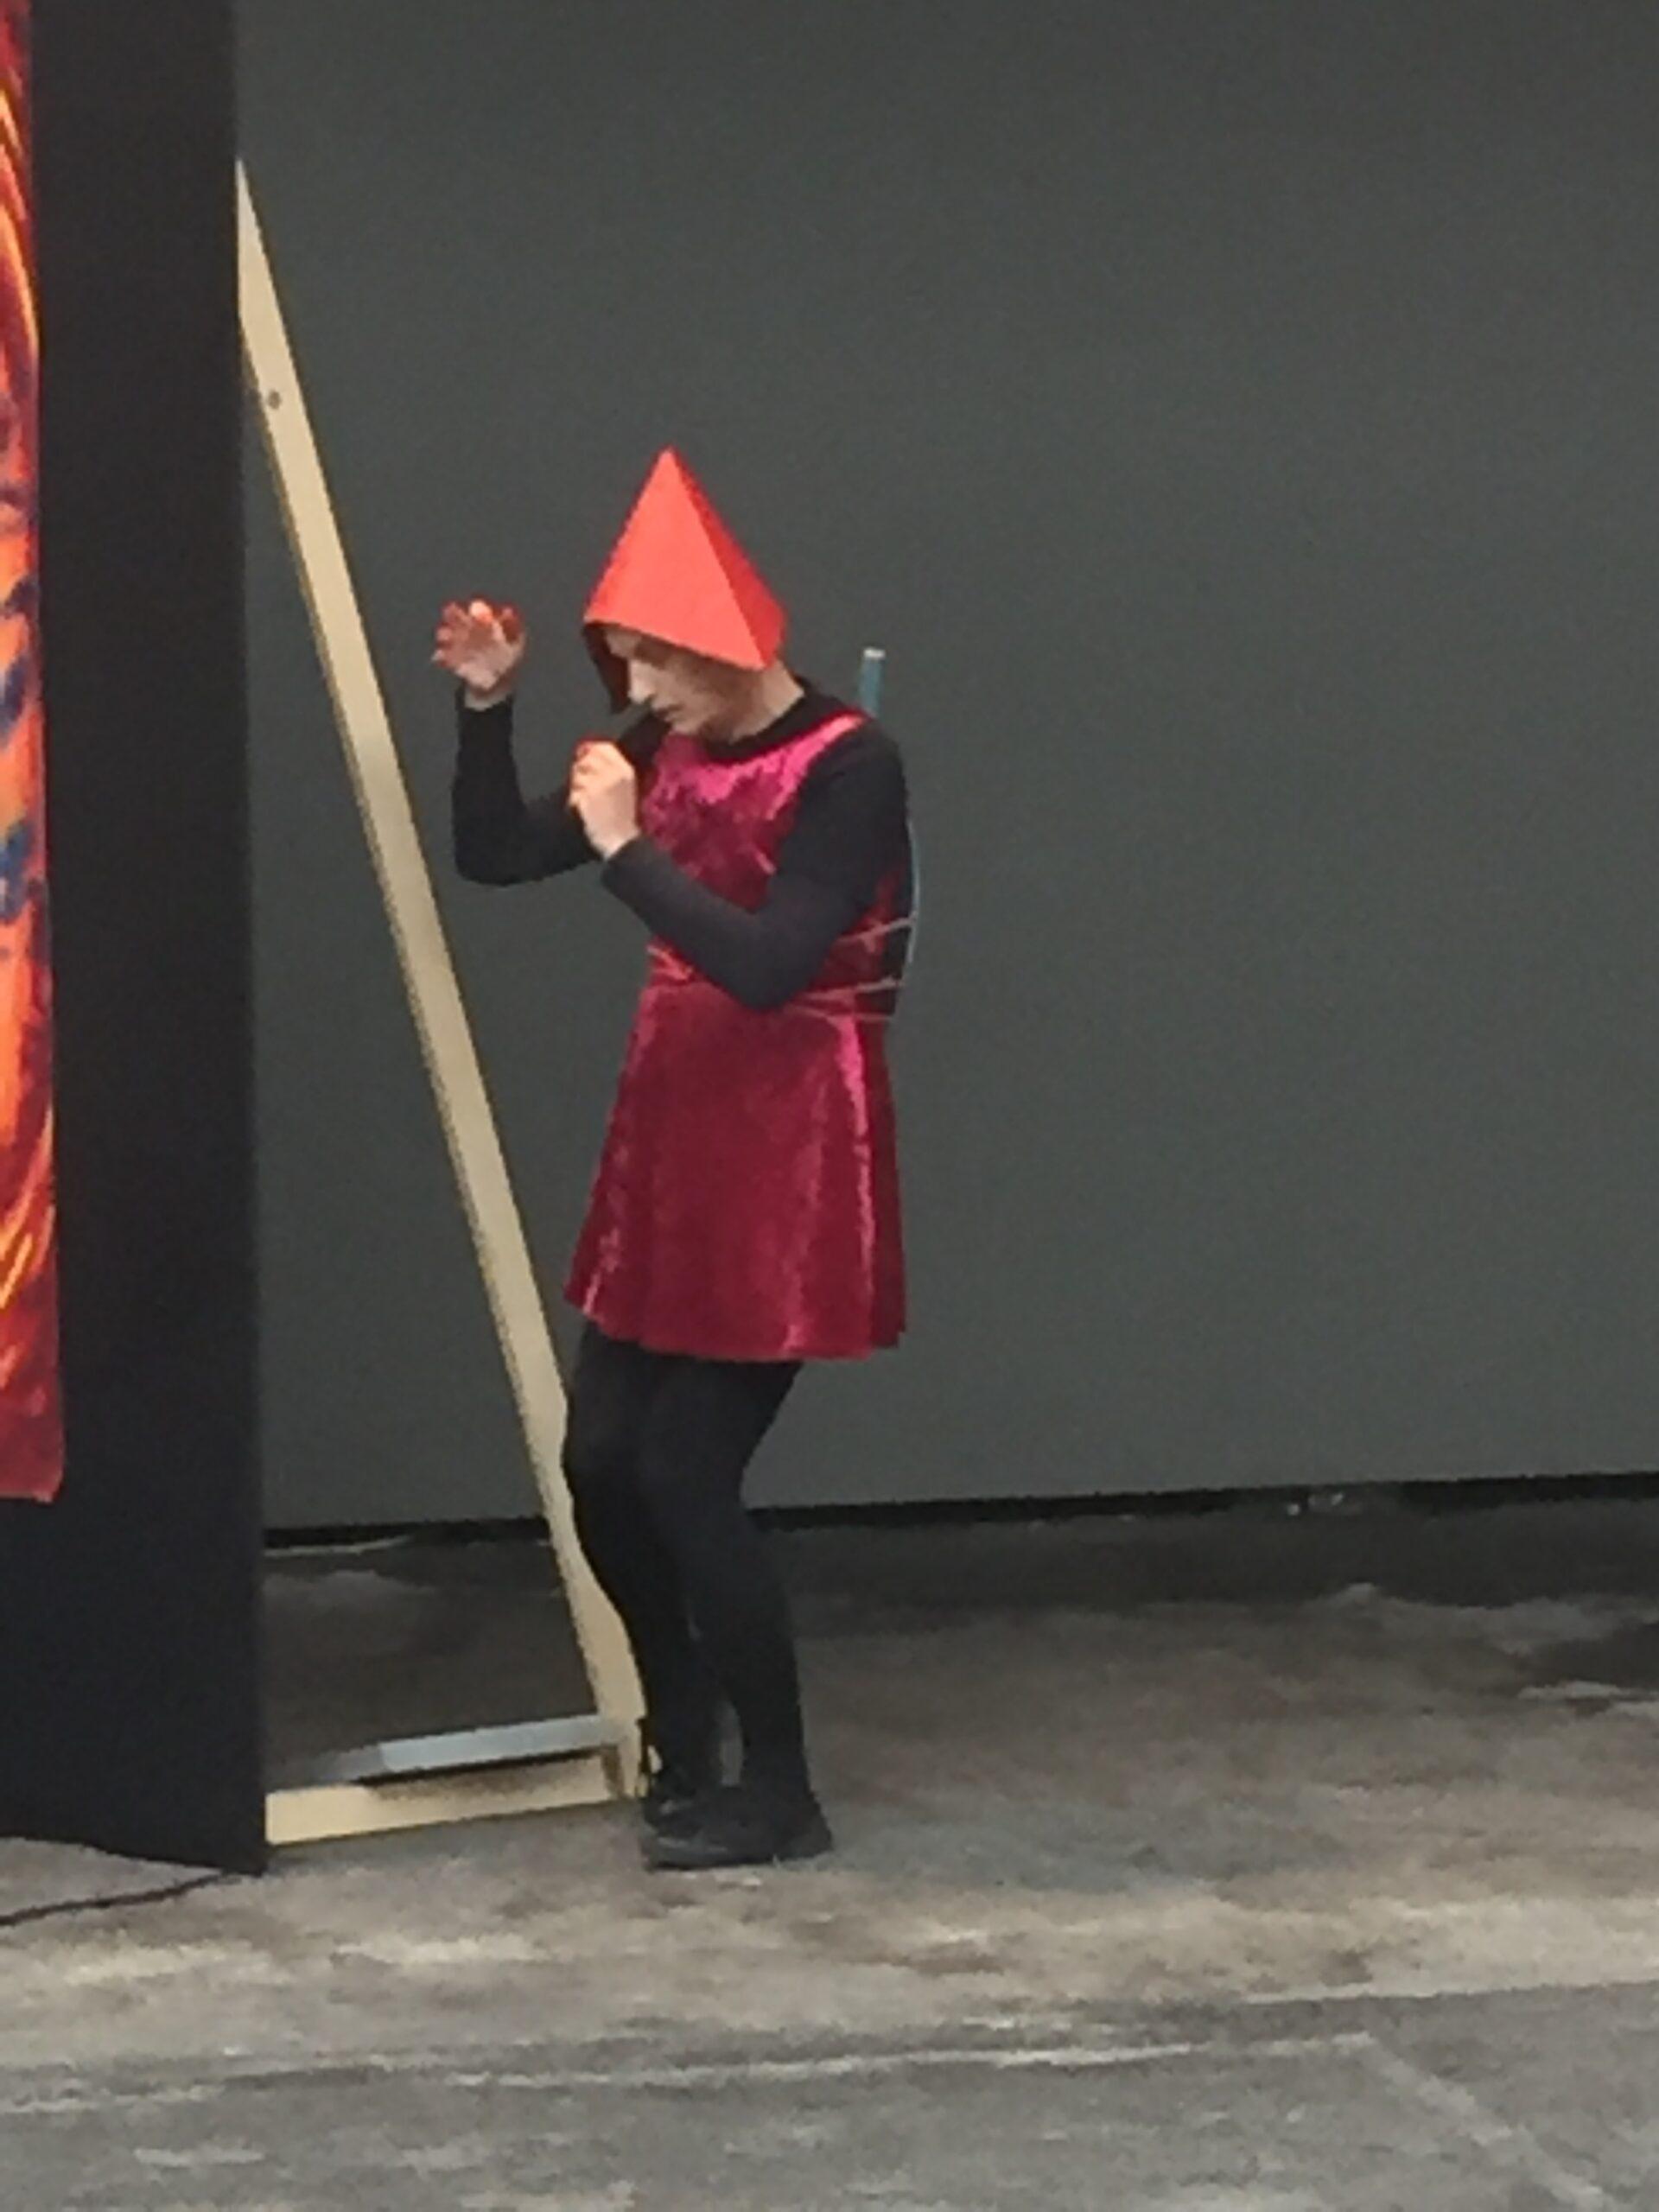 Werkschau Thurgau | Kunsthalle Arbon | Performance René Schmalz, Gesang Gabriella Gombas